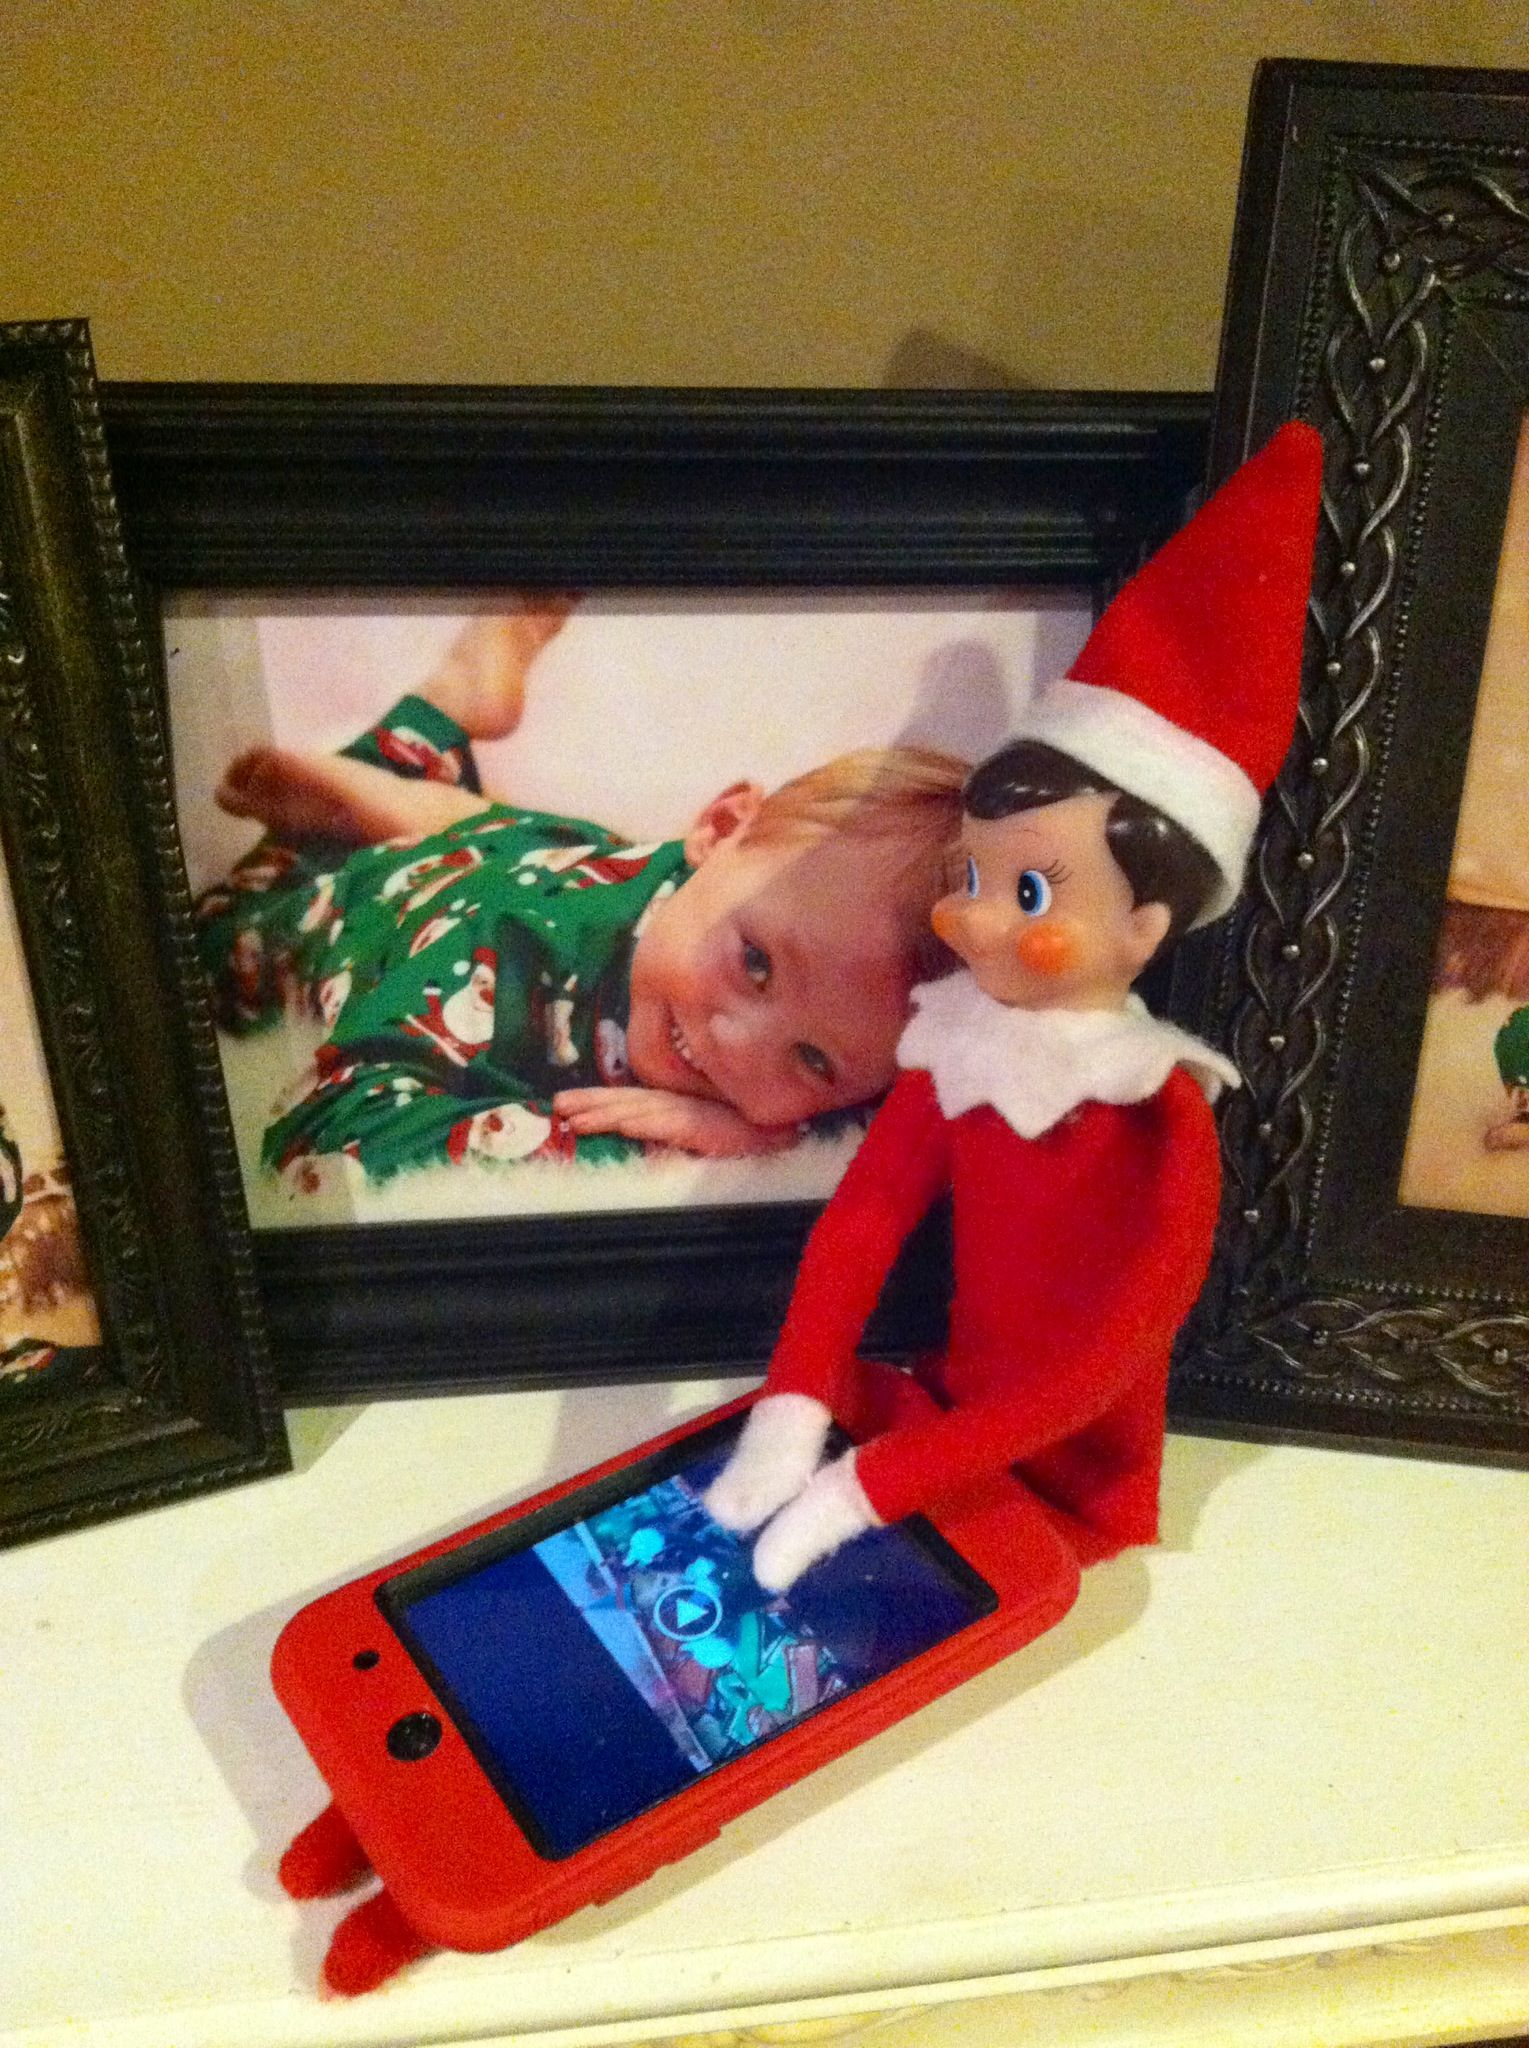 Elf on the Shelf | Elf on the Shelf | Pinterest | Jib jab, Elves and ...